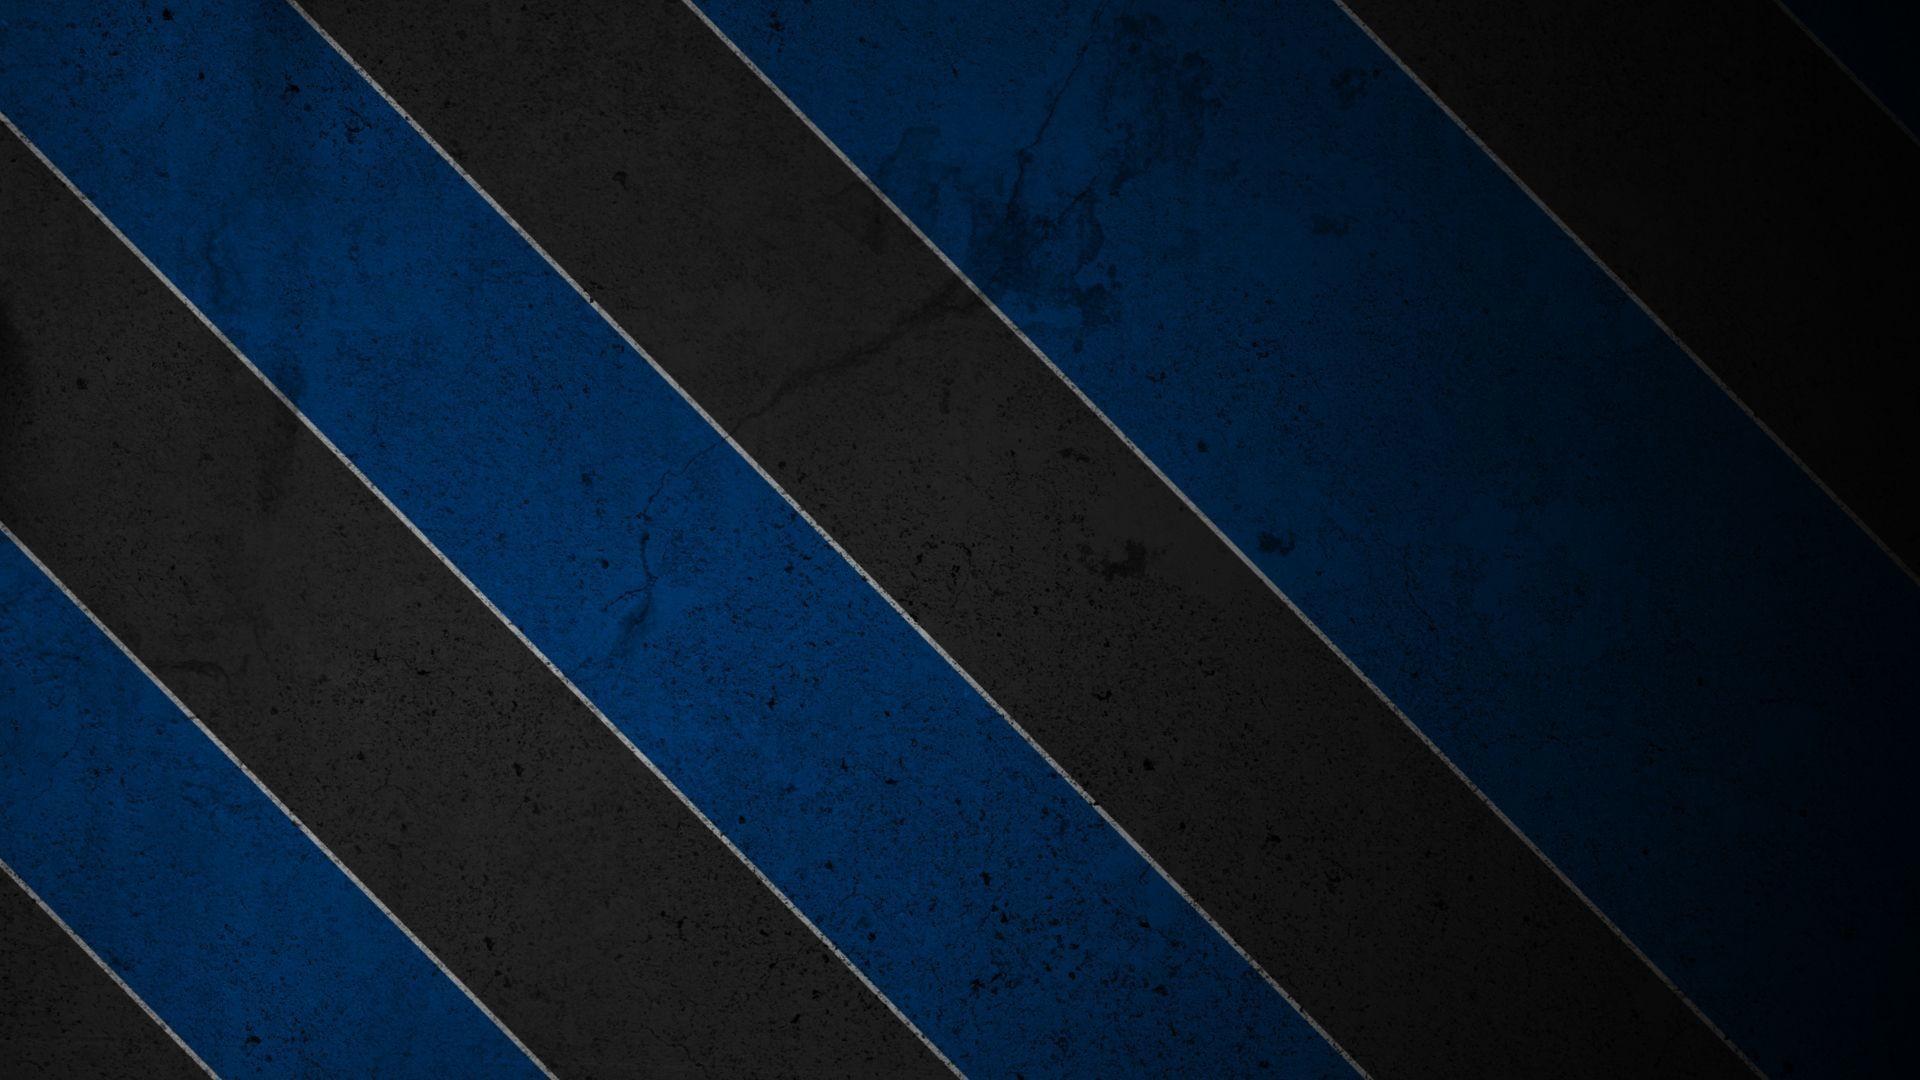 Black and blue stripes wallpaper #18553